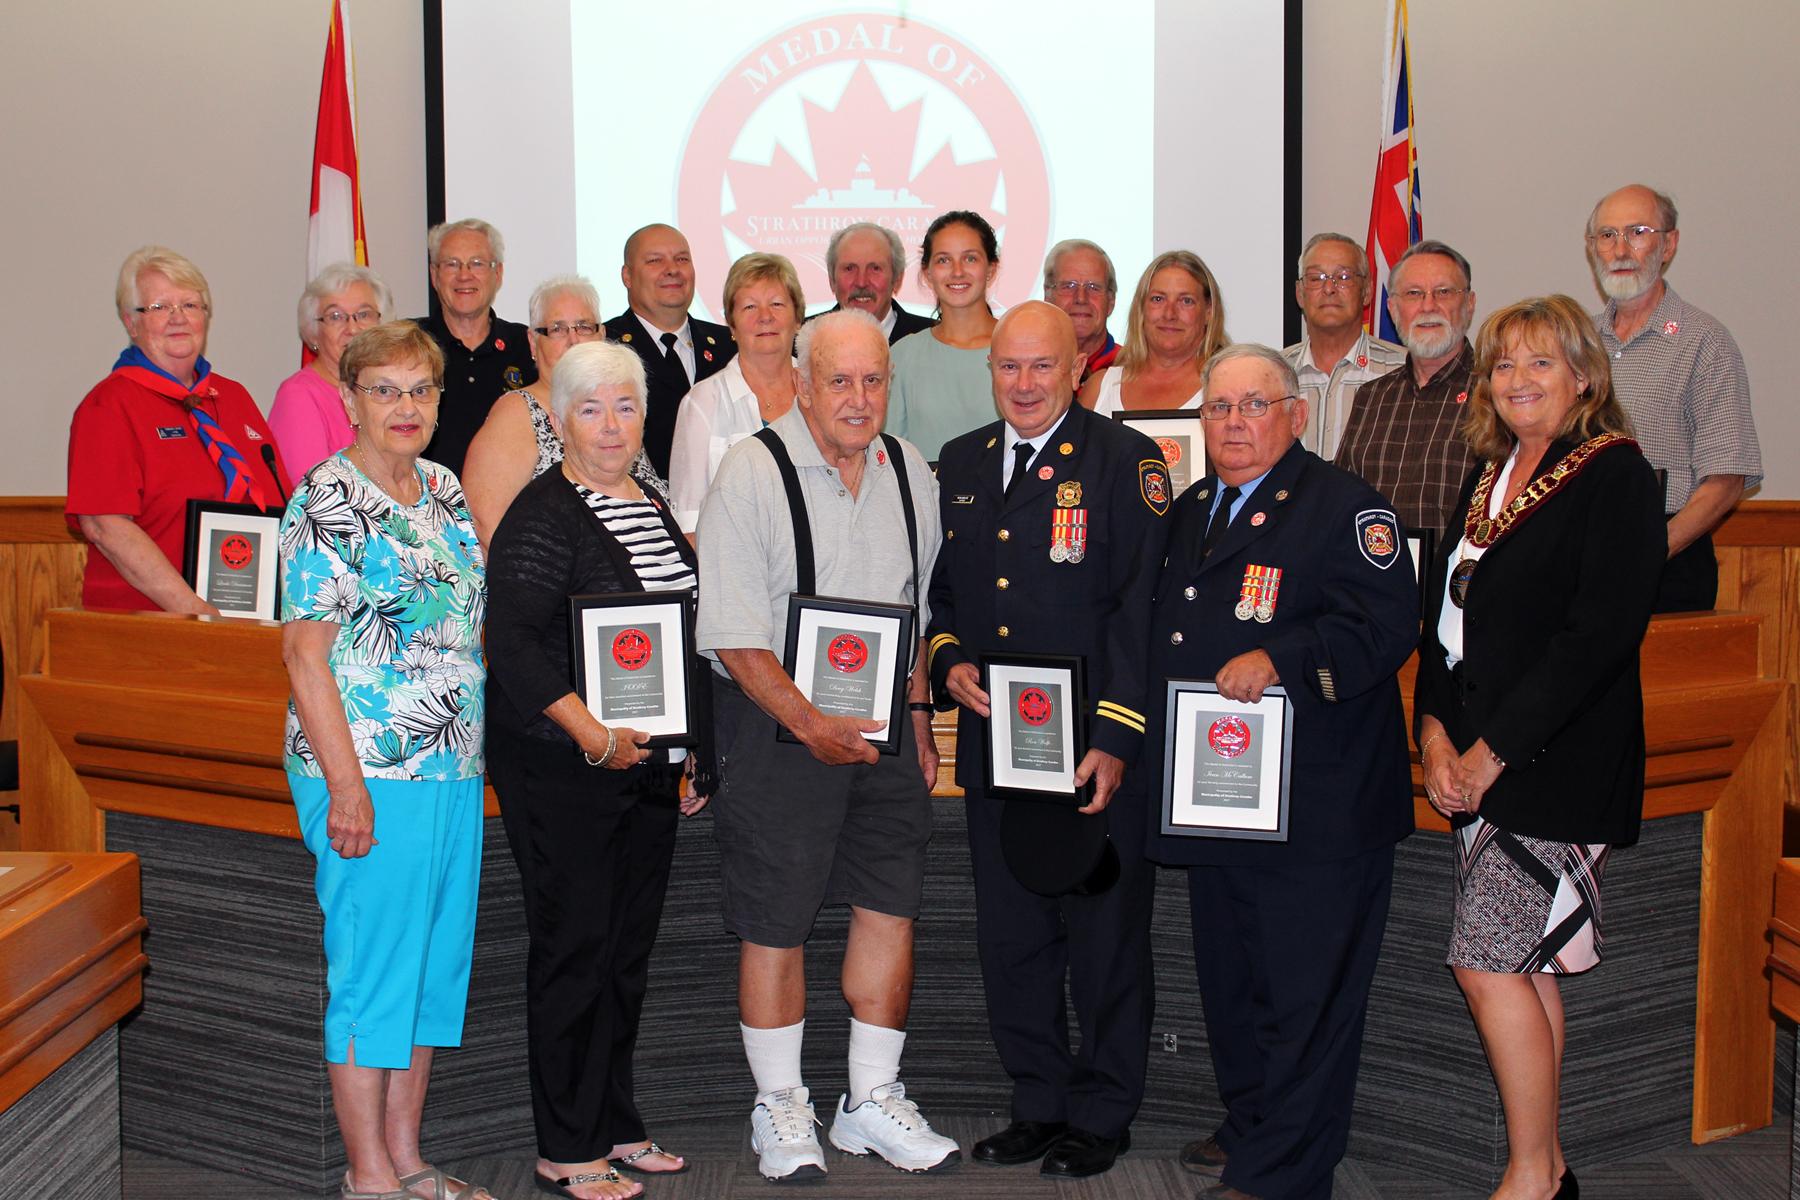 2017 Medal of Distinction Recipients